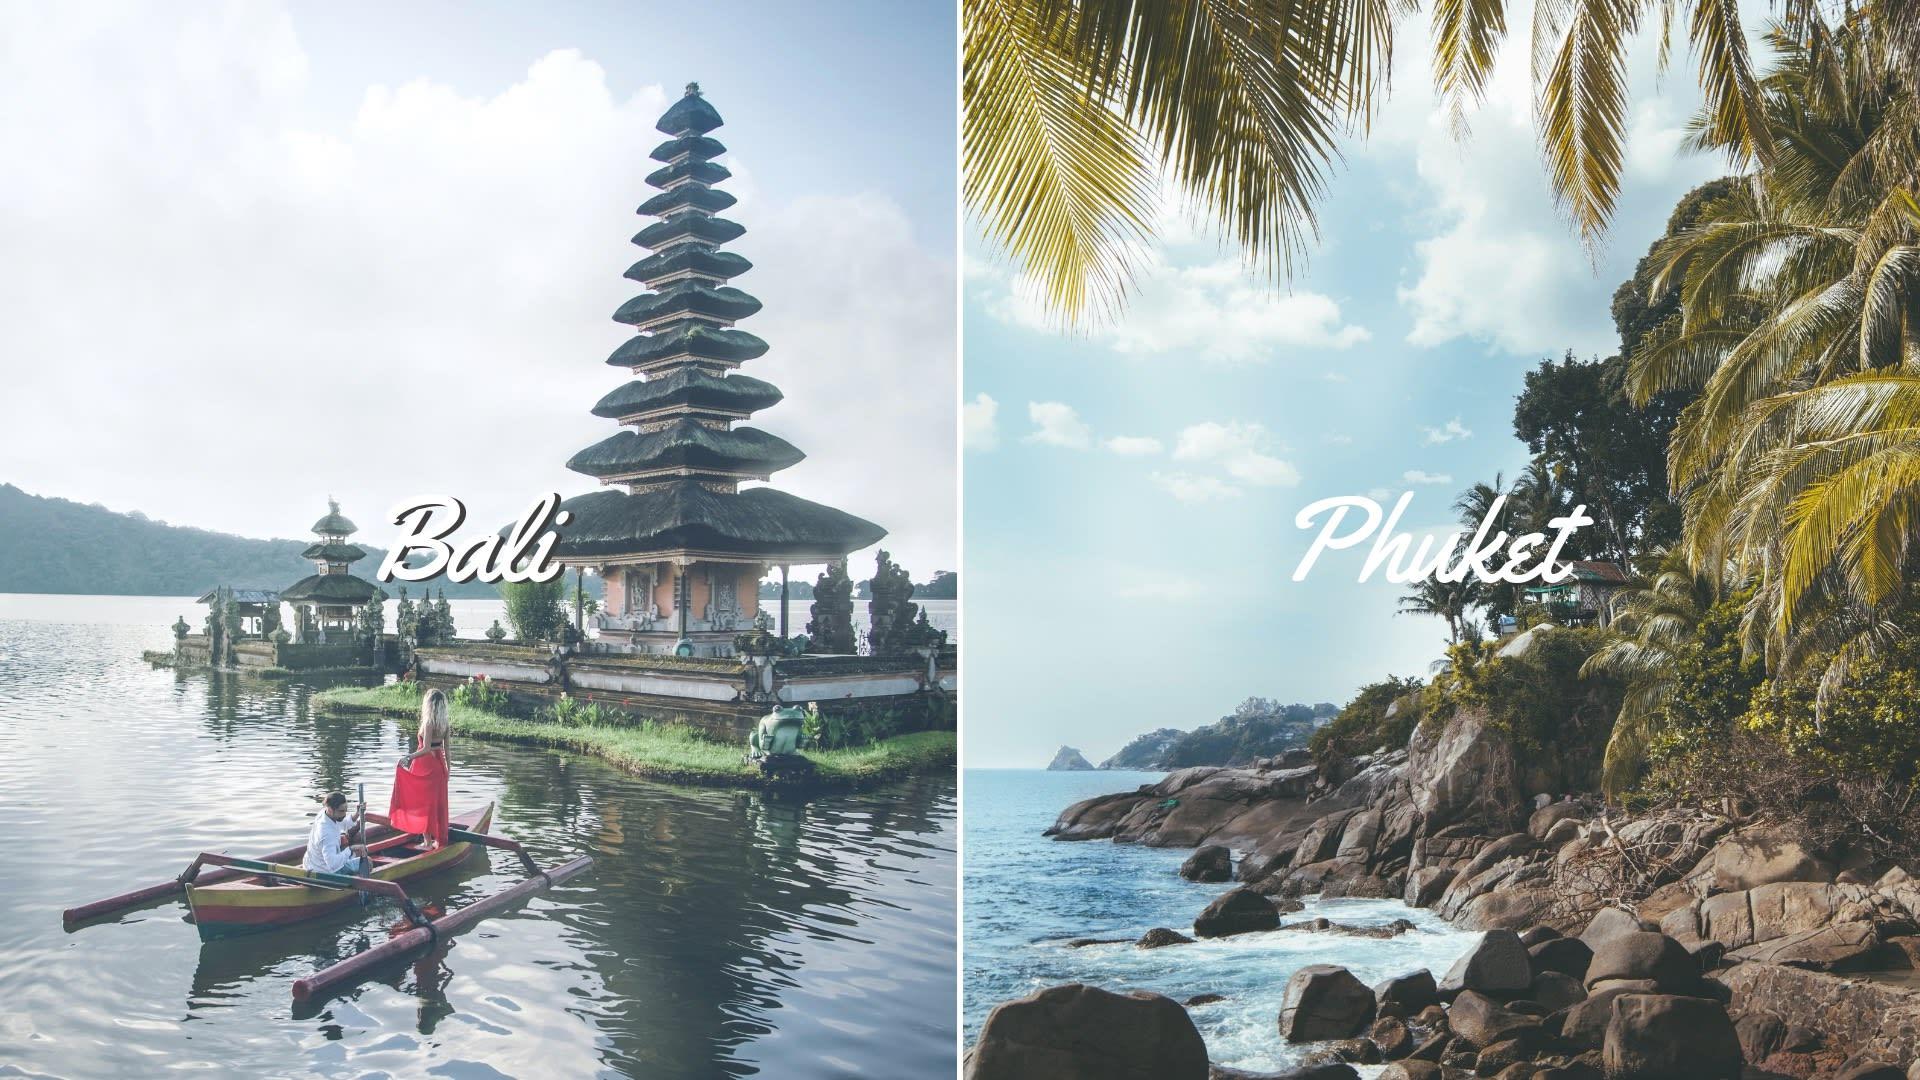 bali and phuket